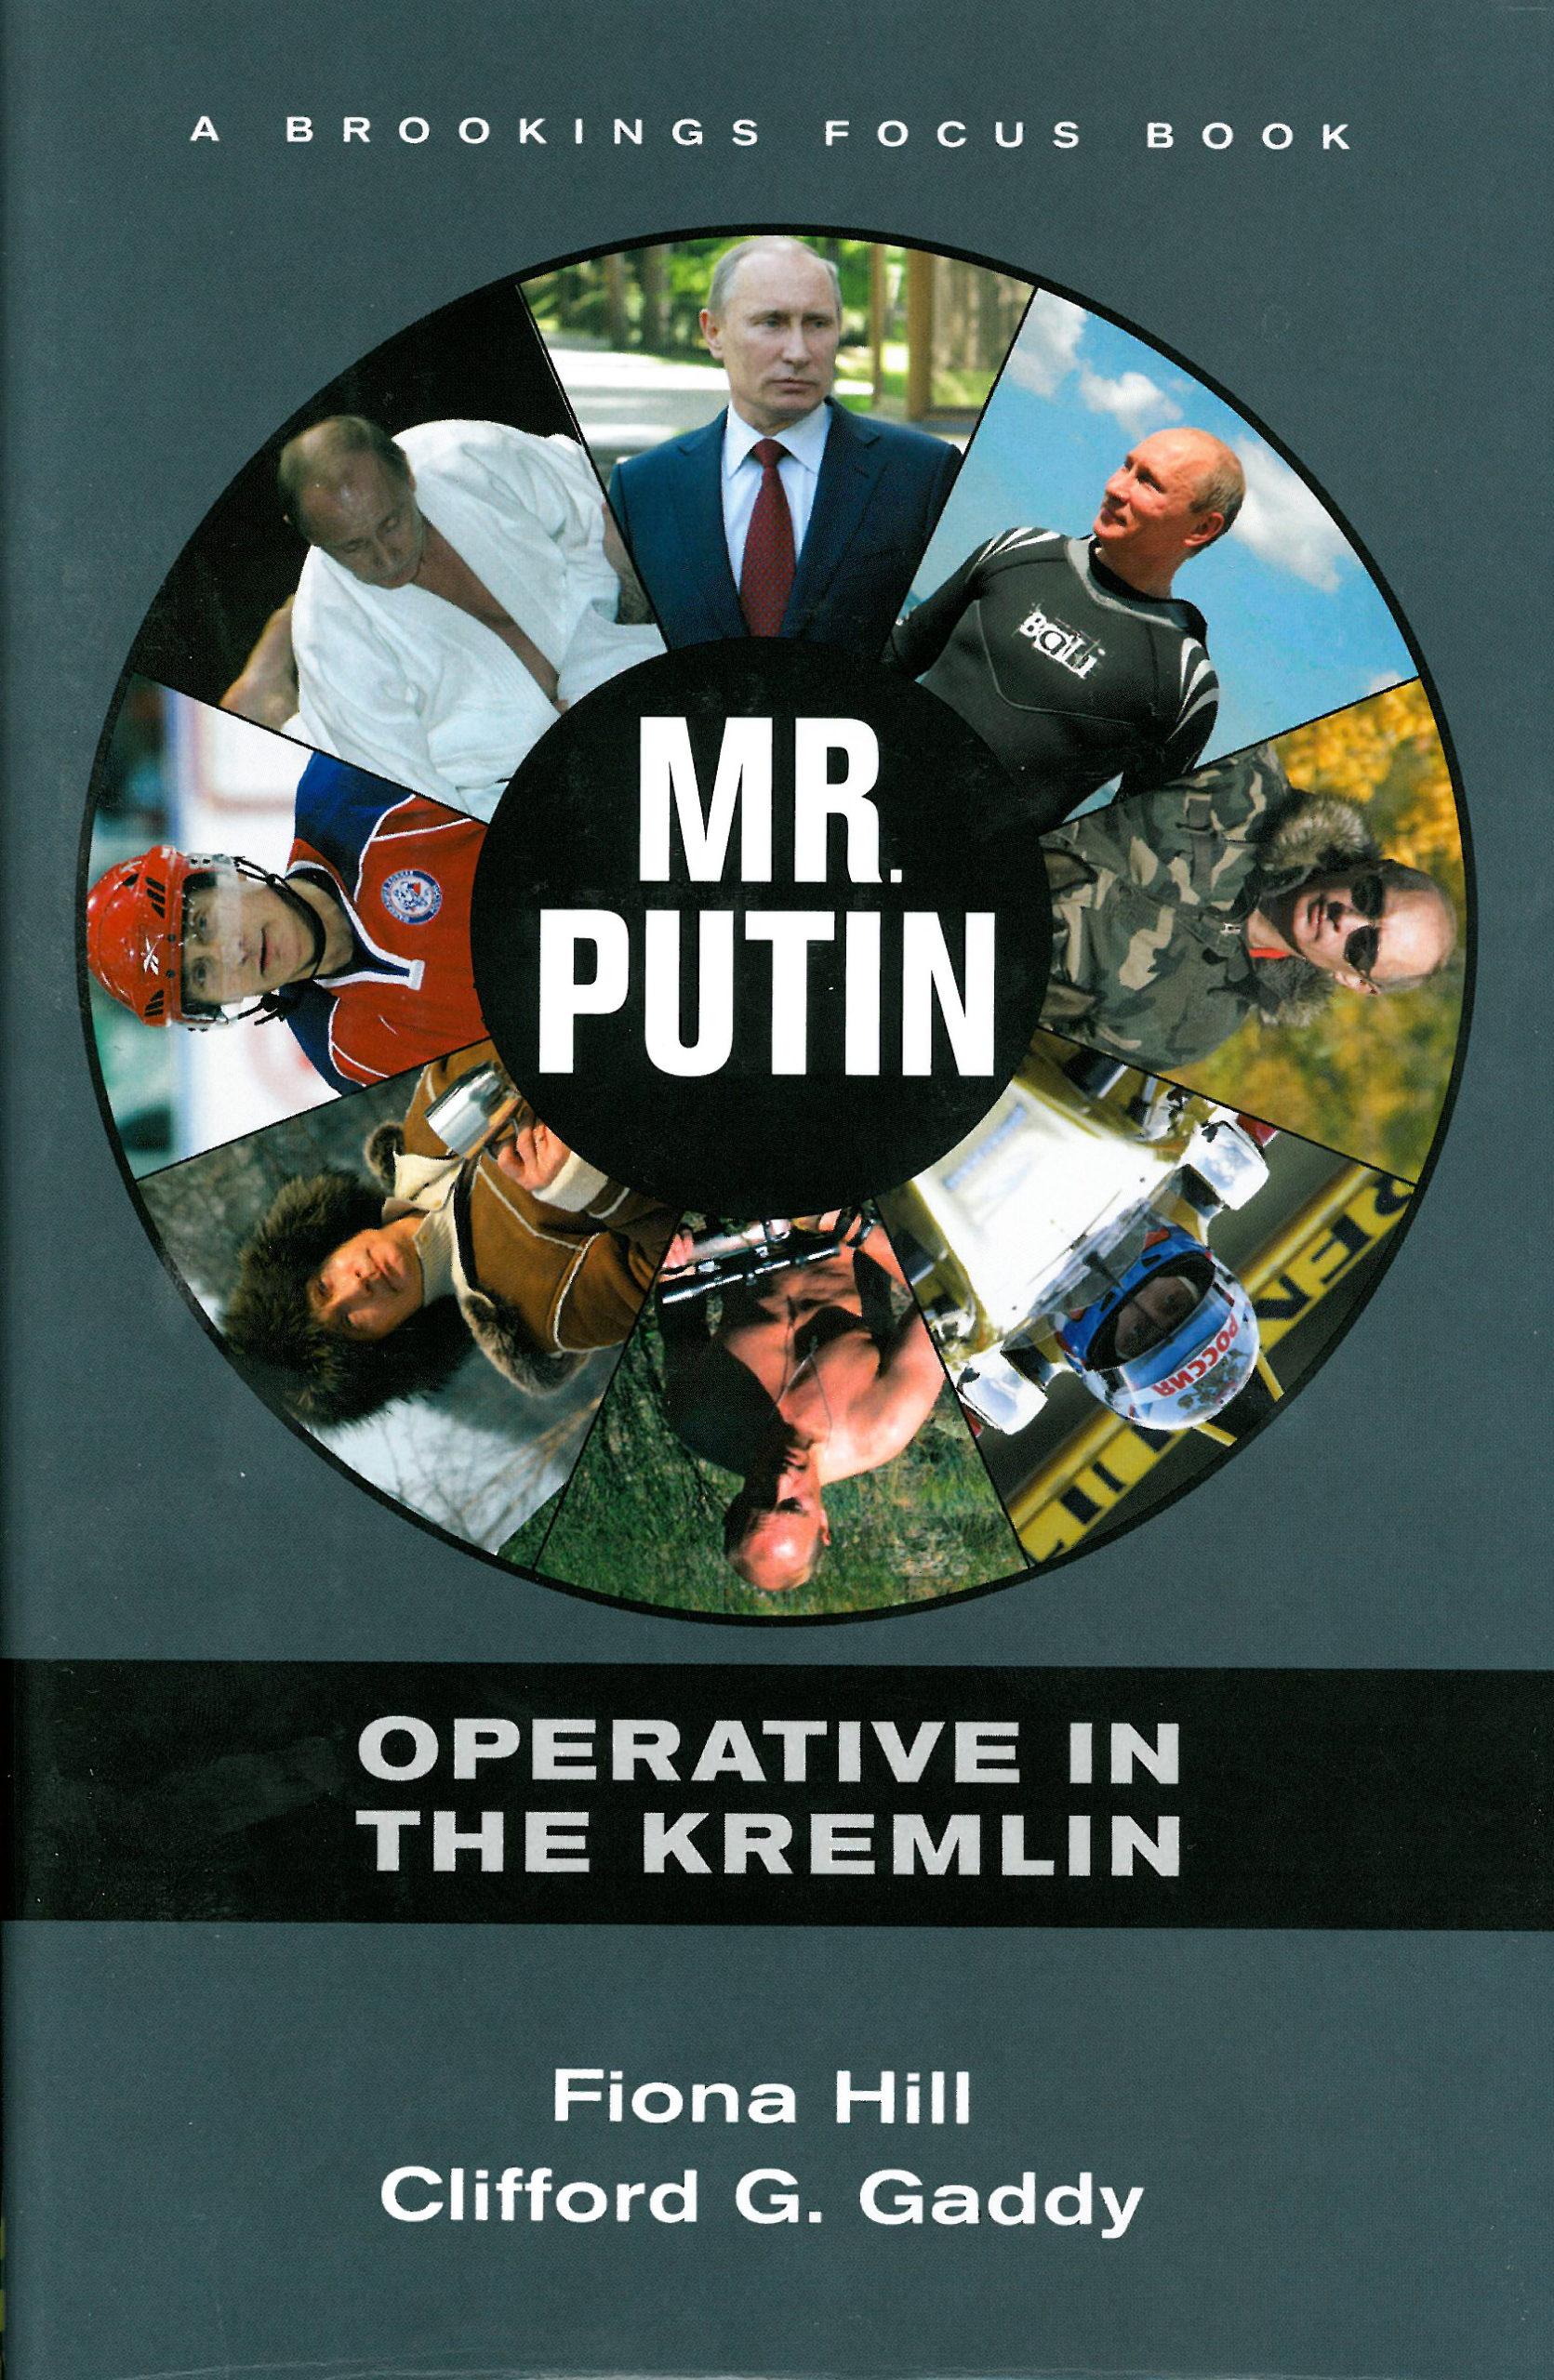 Fiona Hill & Glifford Gaddy: Mr. Putin: Operative in the Kremlin. Brookings Institution Press 2013, 400 s.